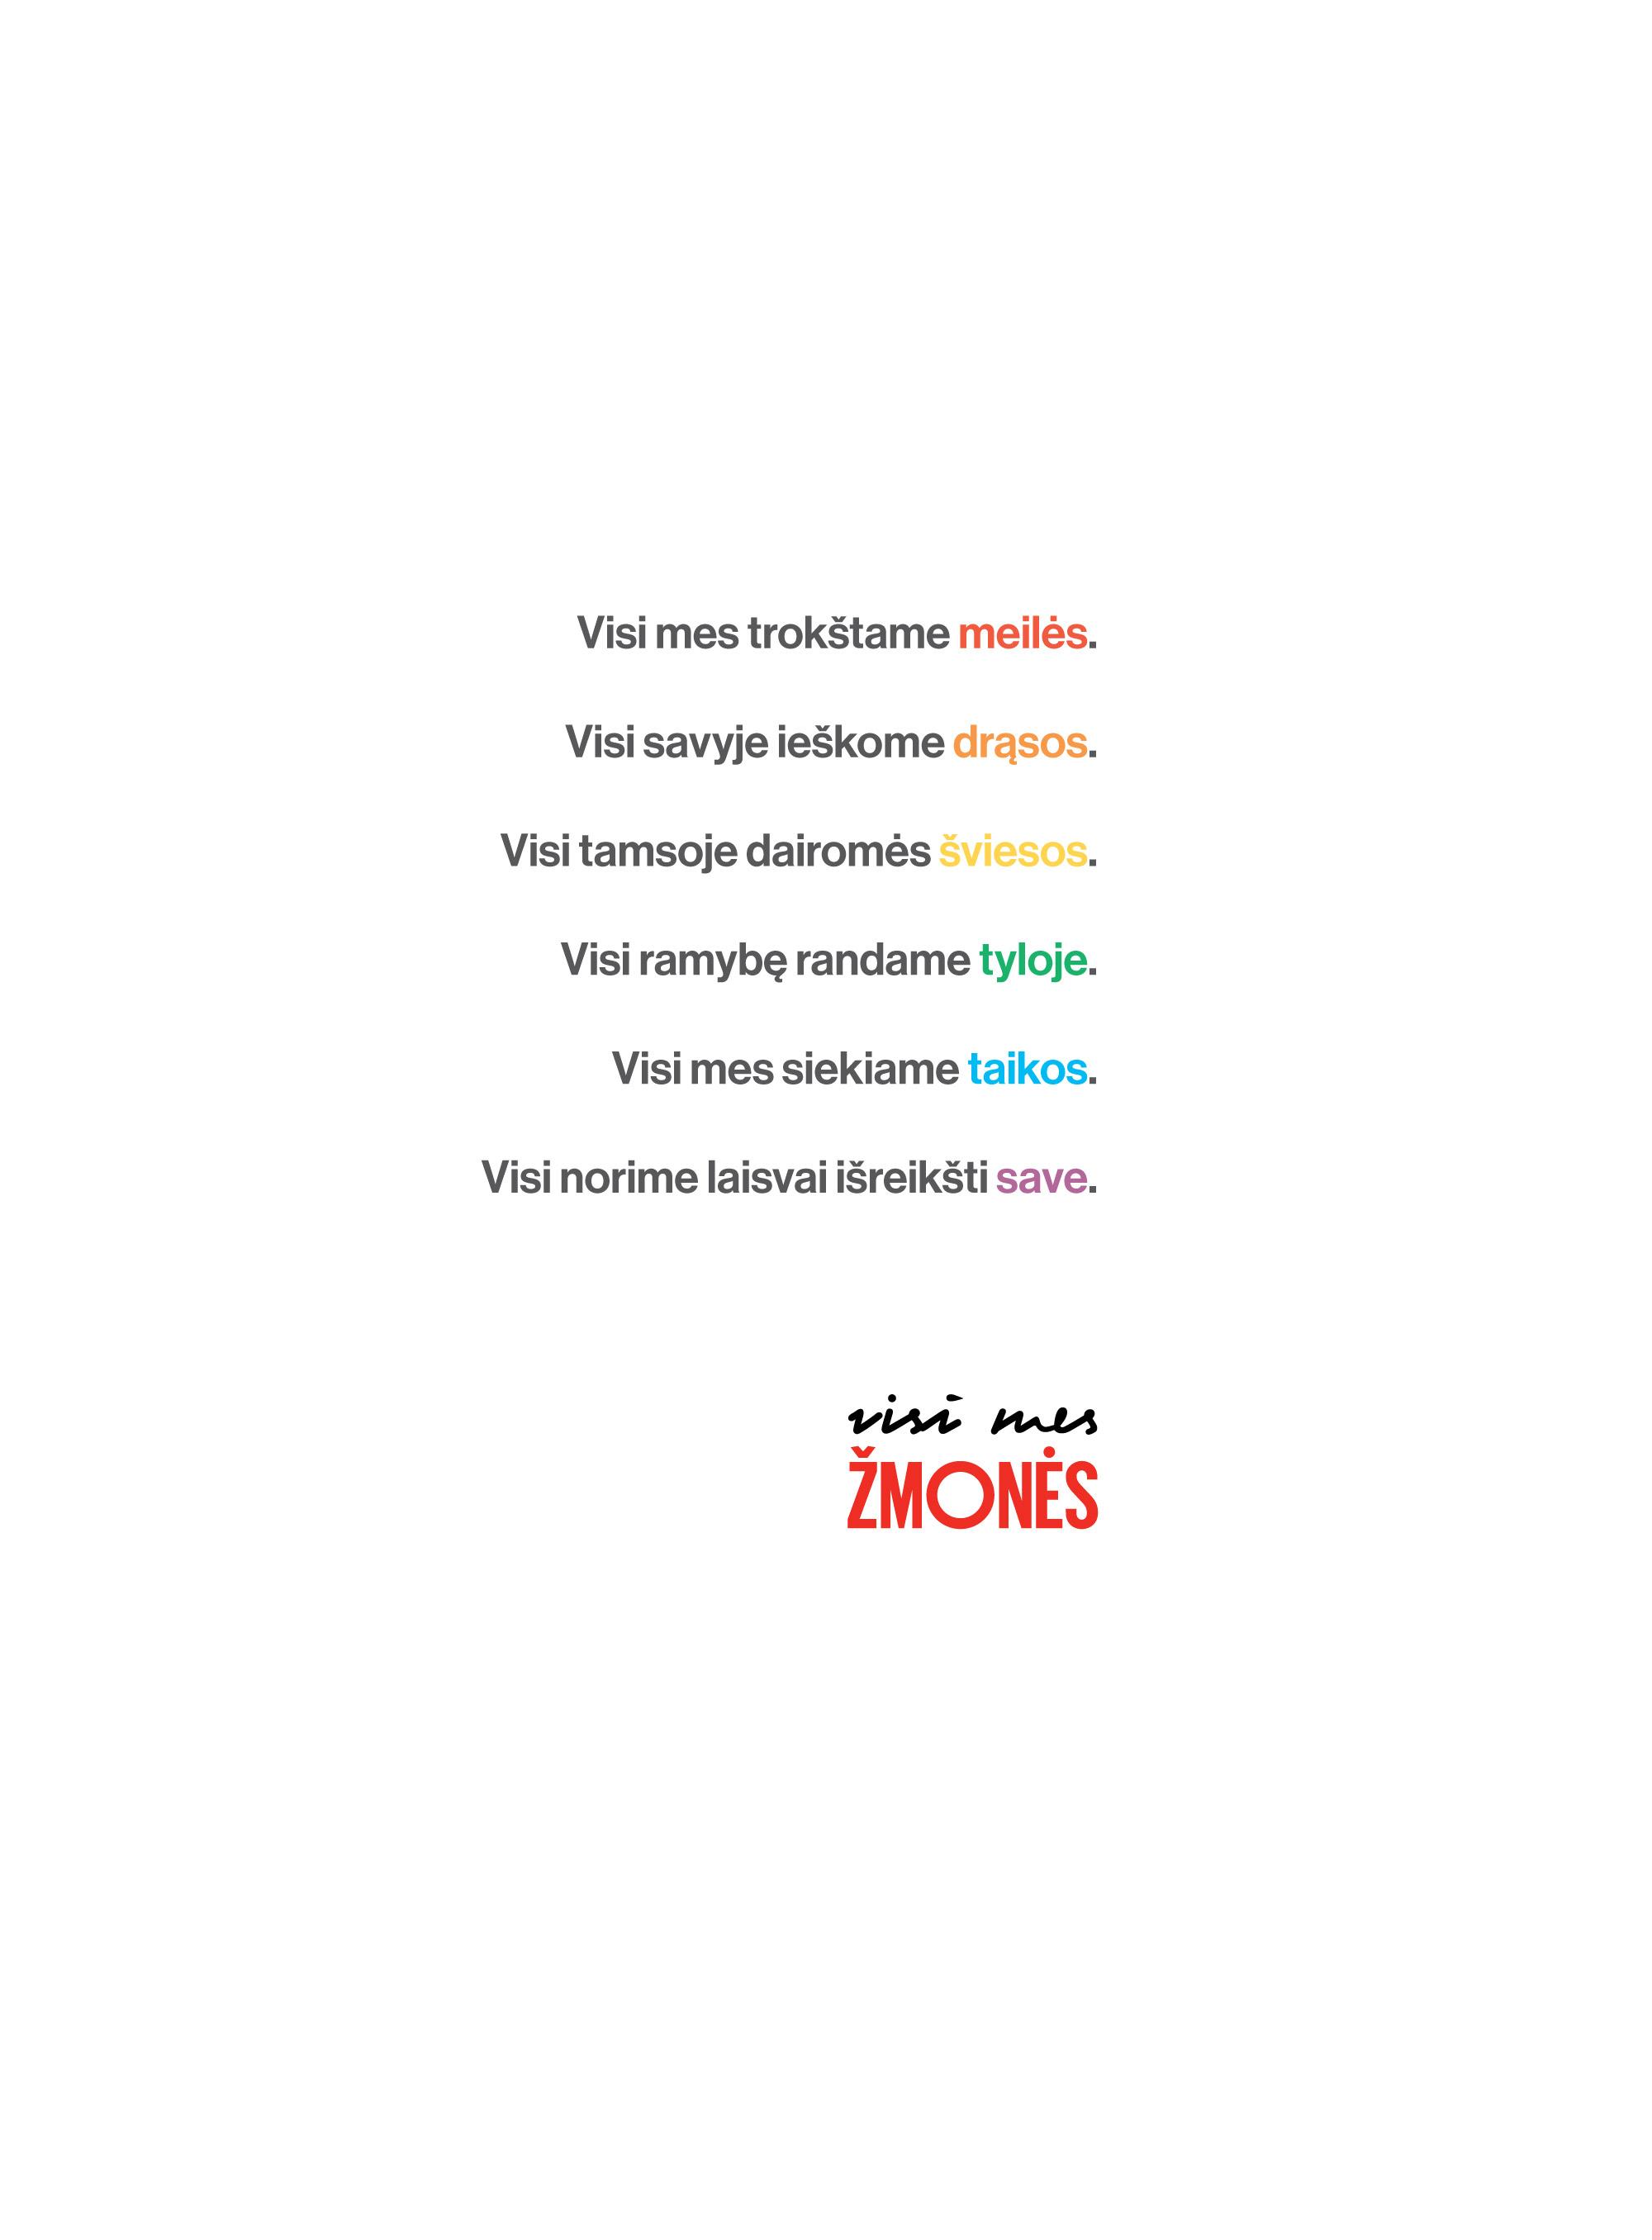 Zmones-Manifestas.jpg